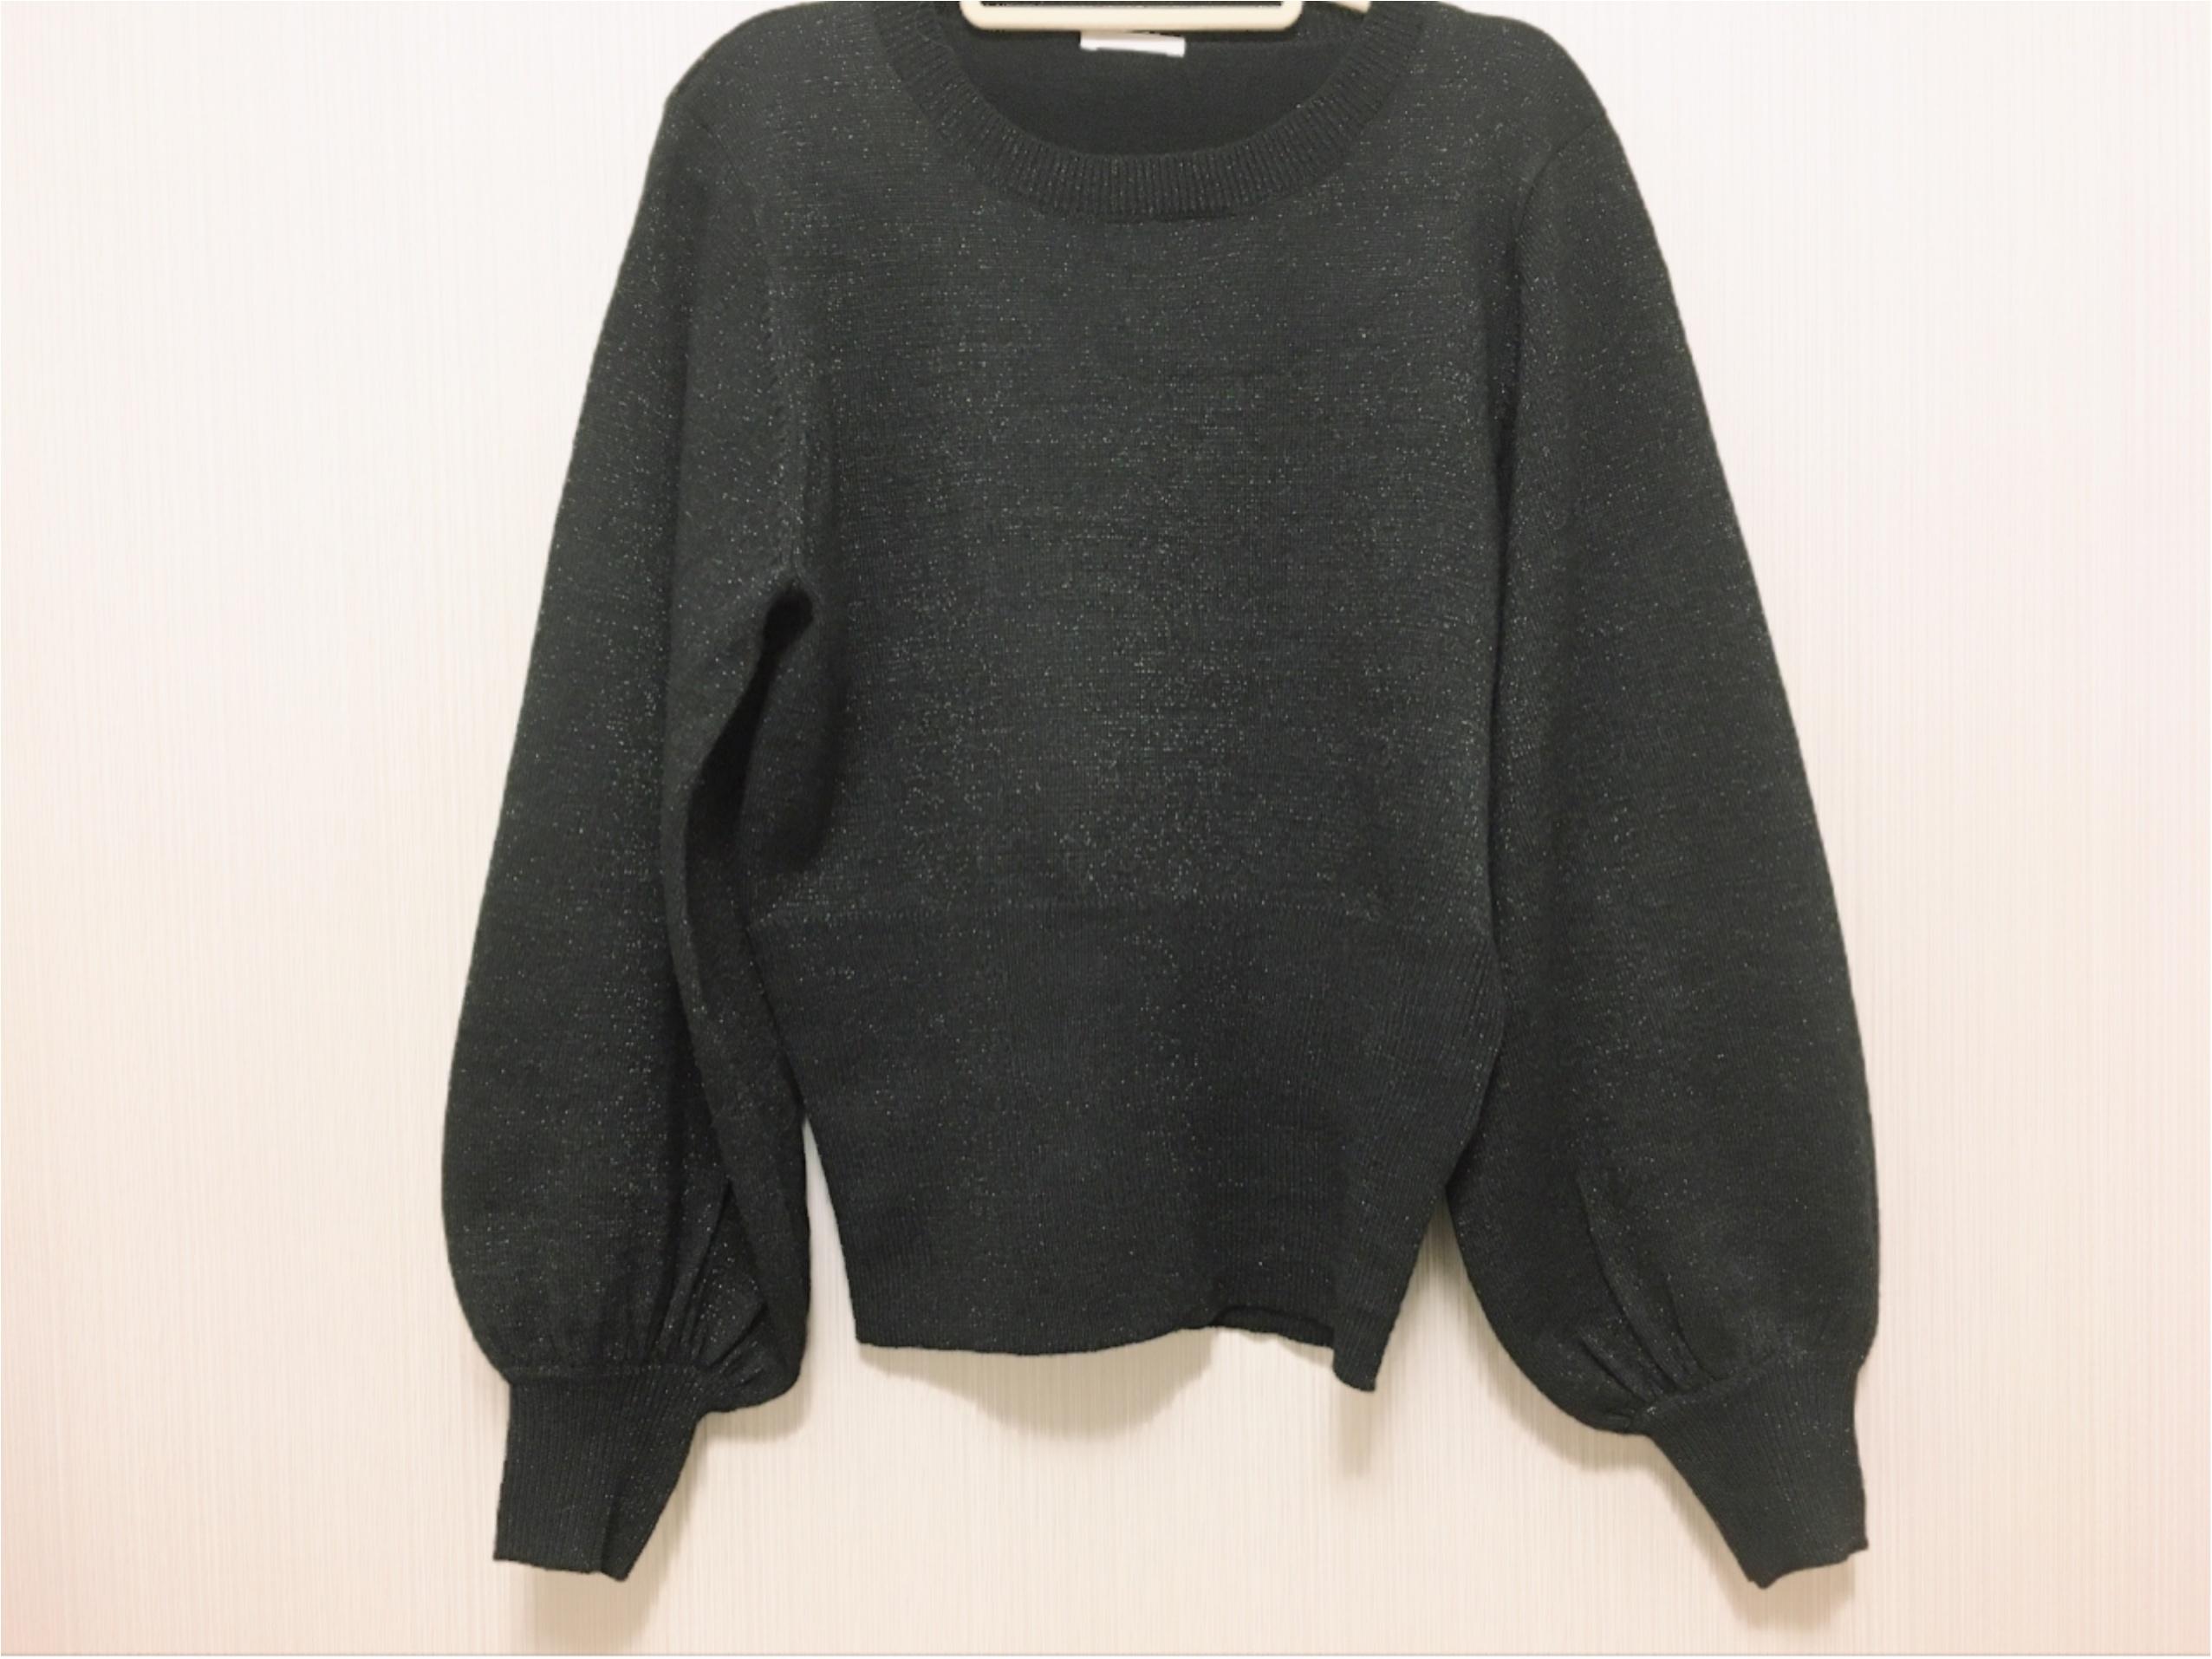 【GU】『ラメパフスリーブセーター』は、あまり取り上げられていない隠れヒット服!_1